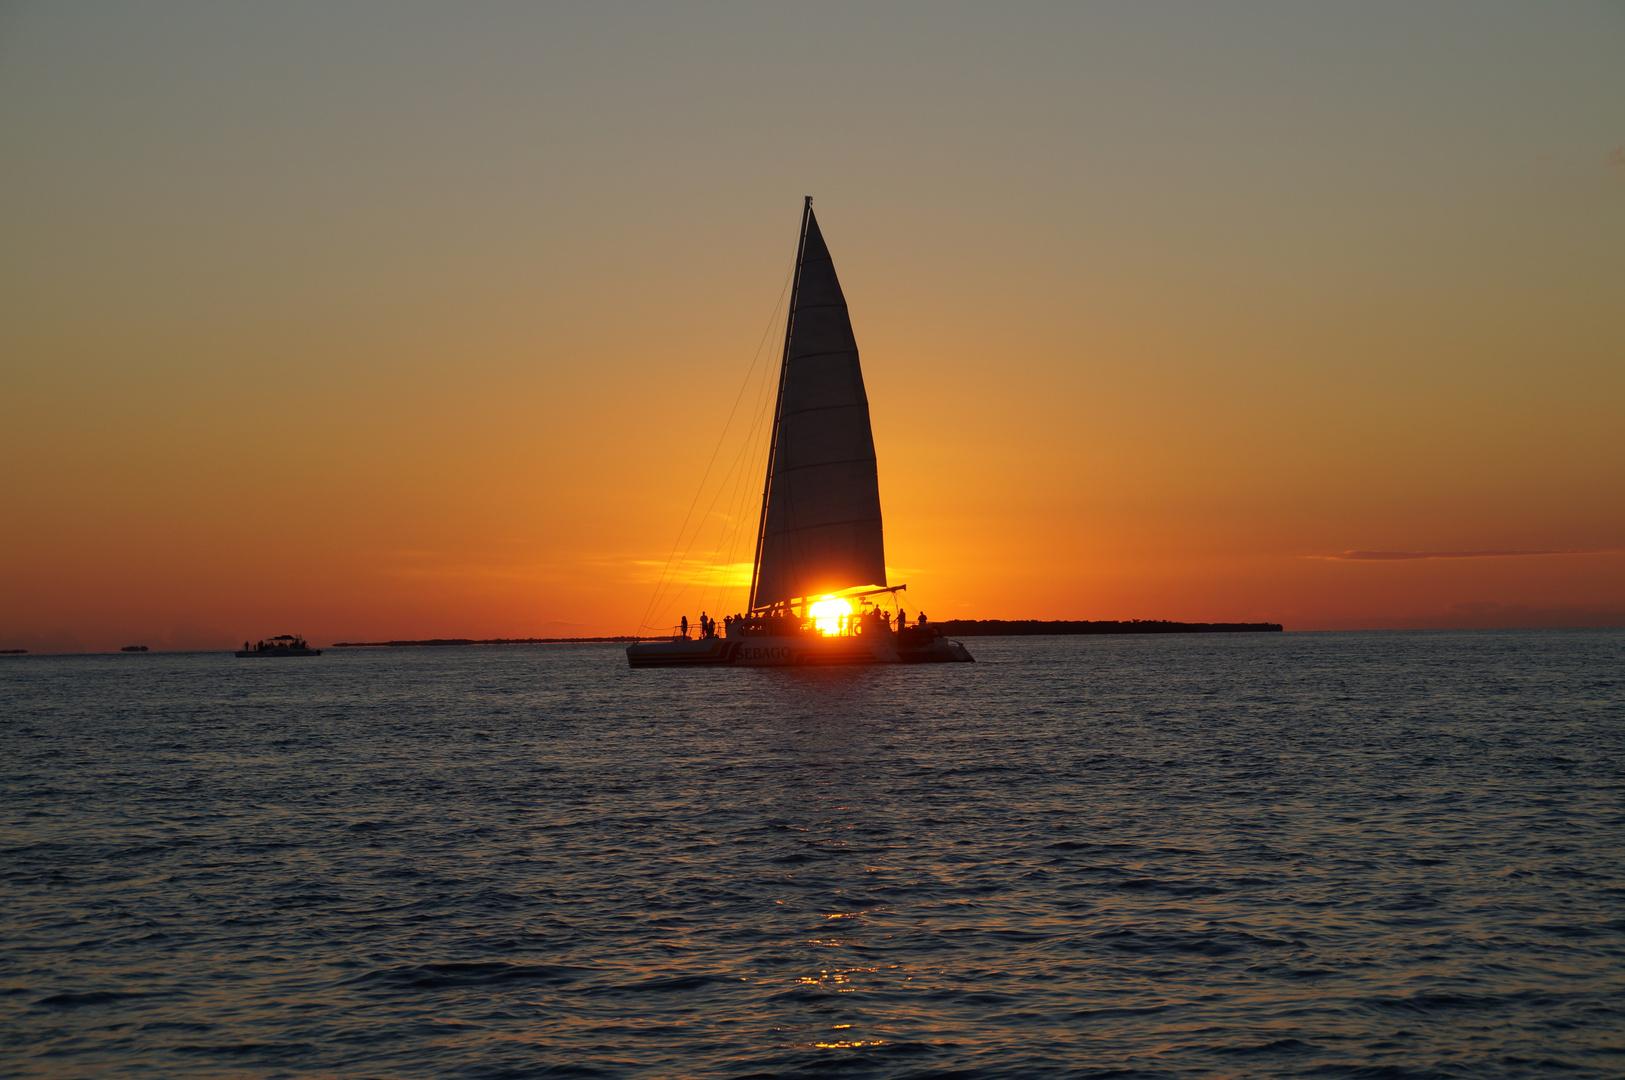 Sonnenuntergang in Florida